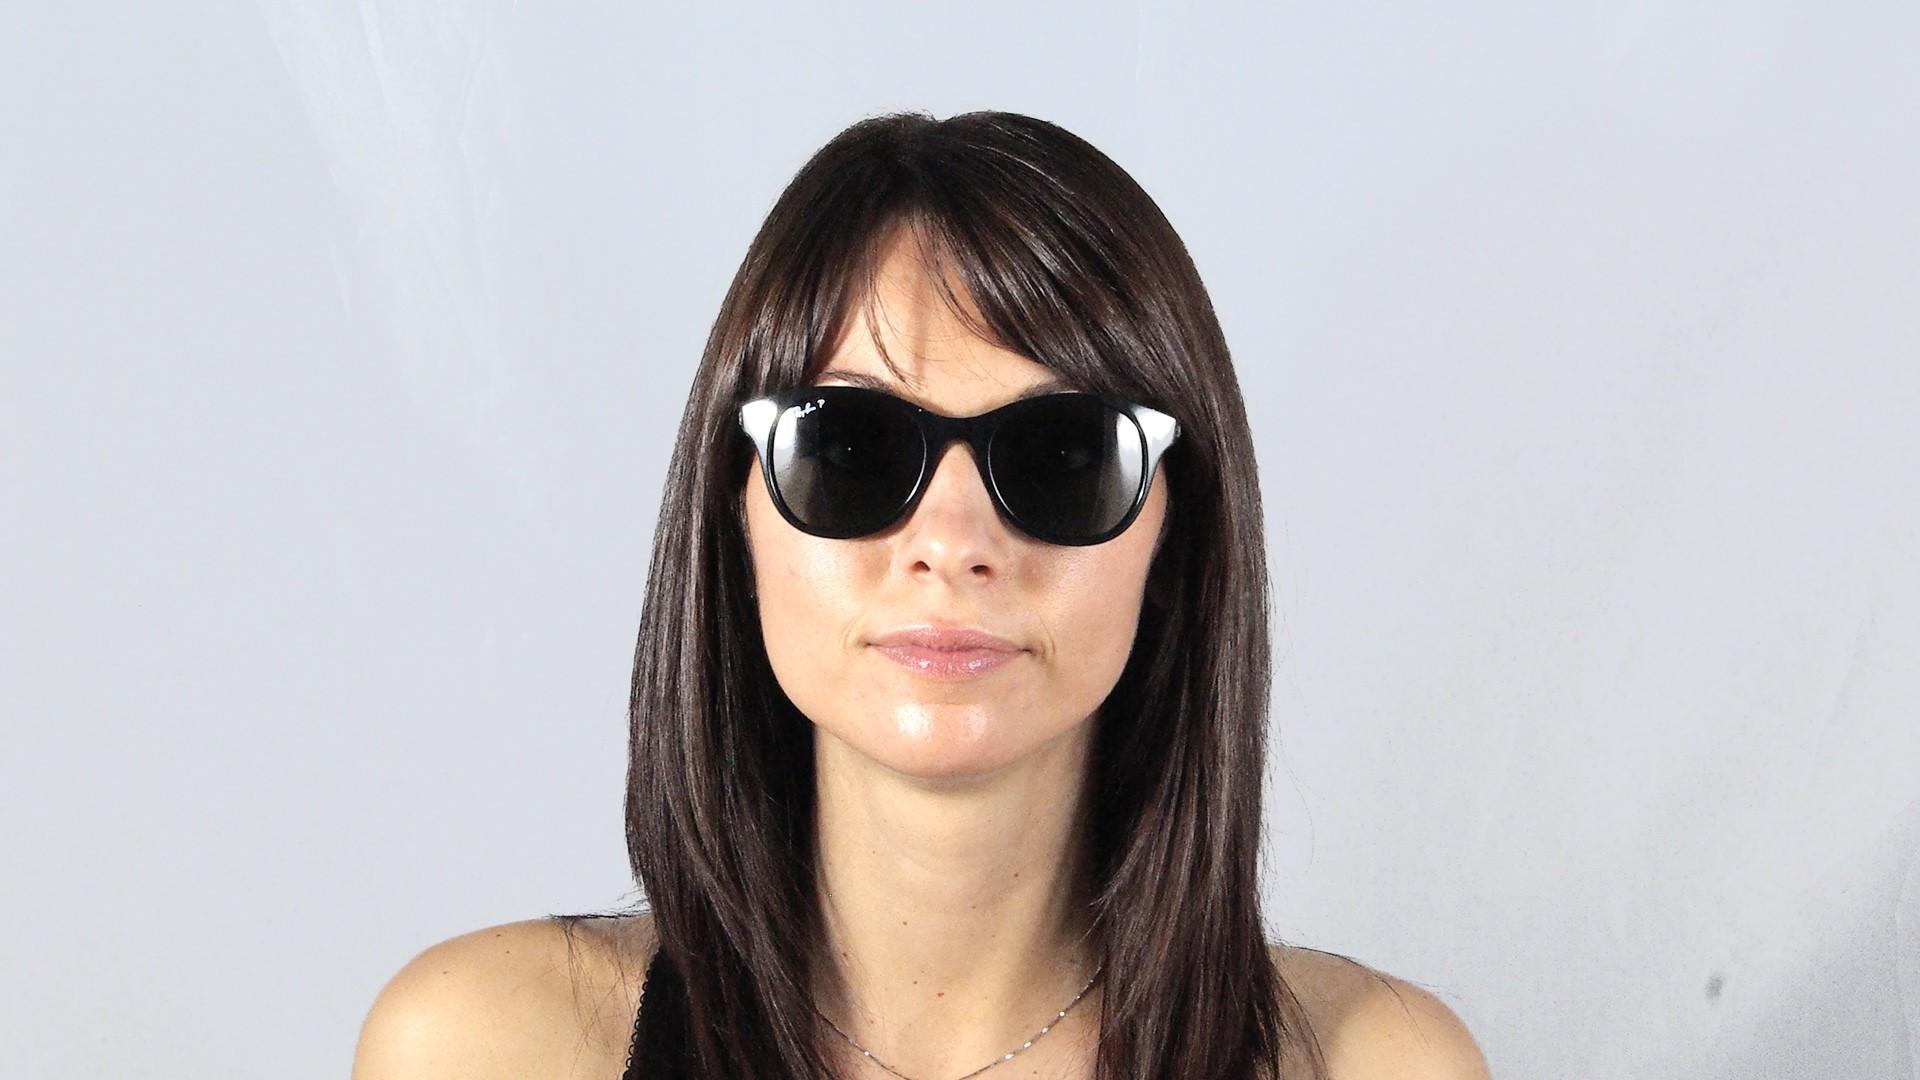 Lu tes De Vue Noires Et Blanches Lu tes Wayfarer Noires Dessin Lu tes Noires 6252 further Nylon in addition Triangle Sunglasses likewise Oakley aviator for men sunglasses likewise Wayfarer. on ray ban wayfarer